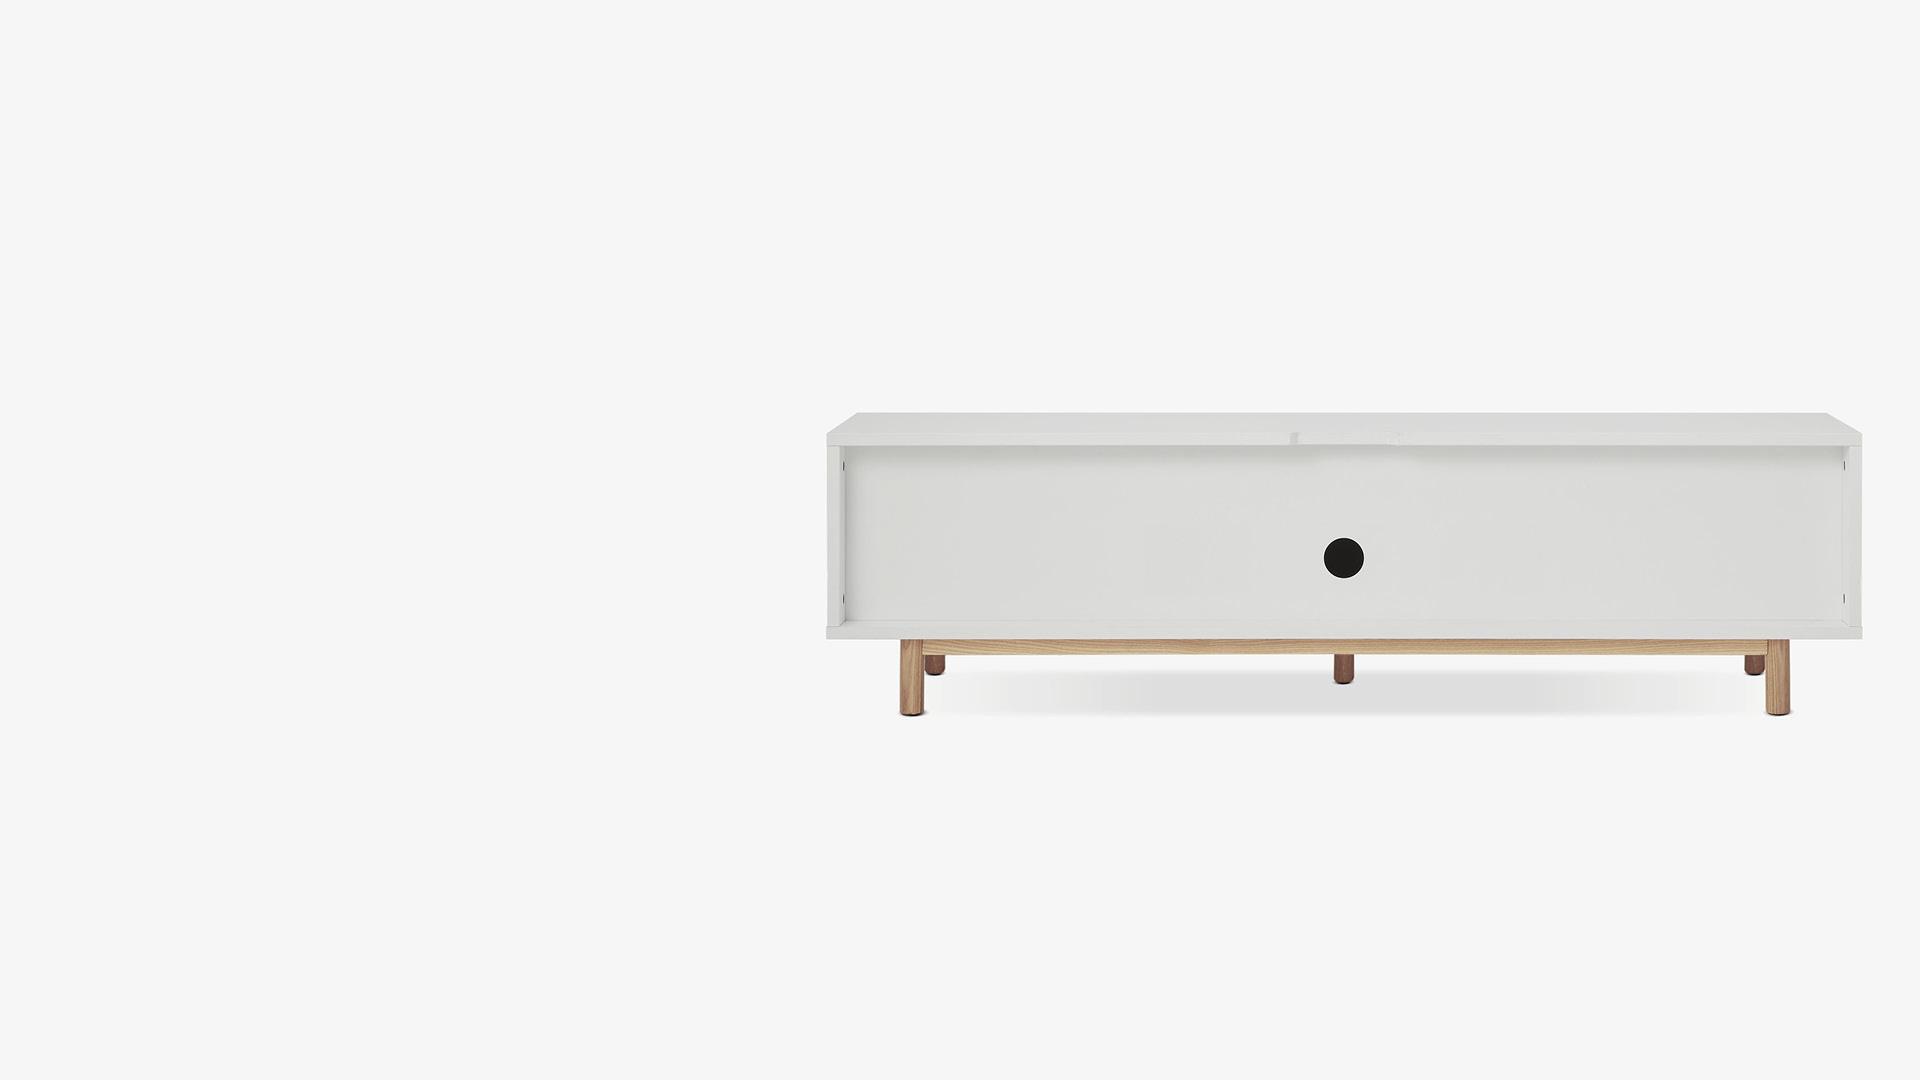 5cm孔洞+7cm隐藏底板<br/>走线与集线的有序中心